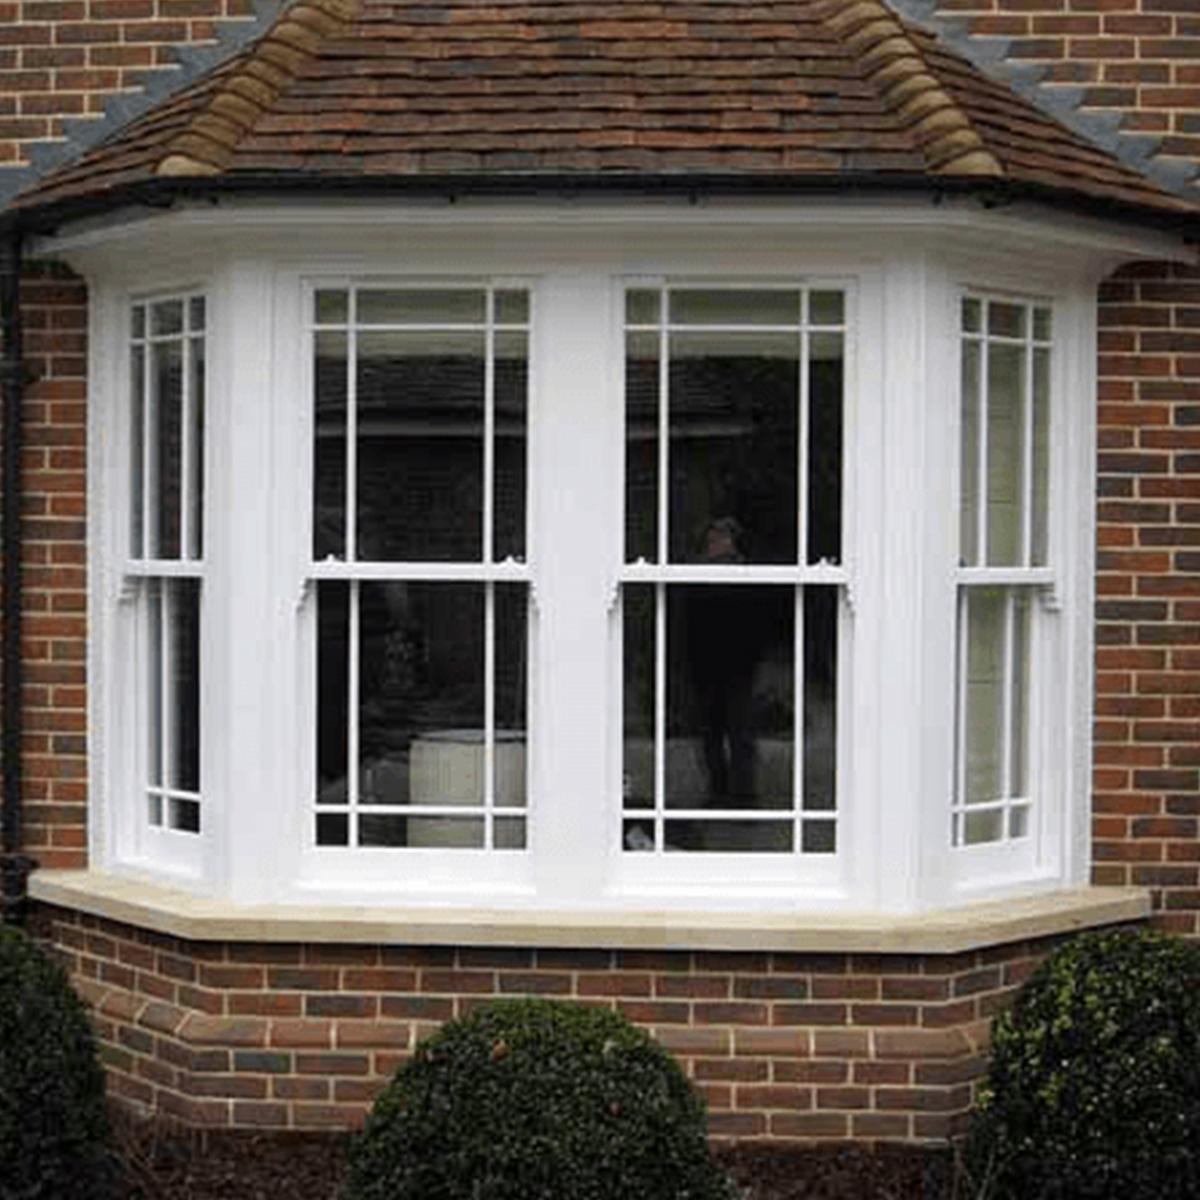 Box sash windows